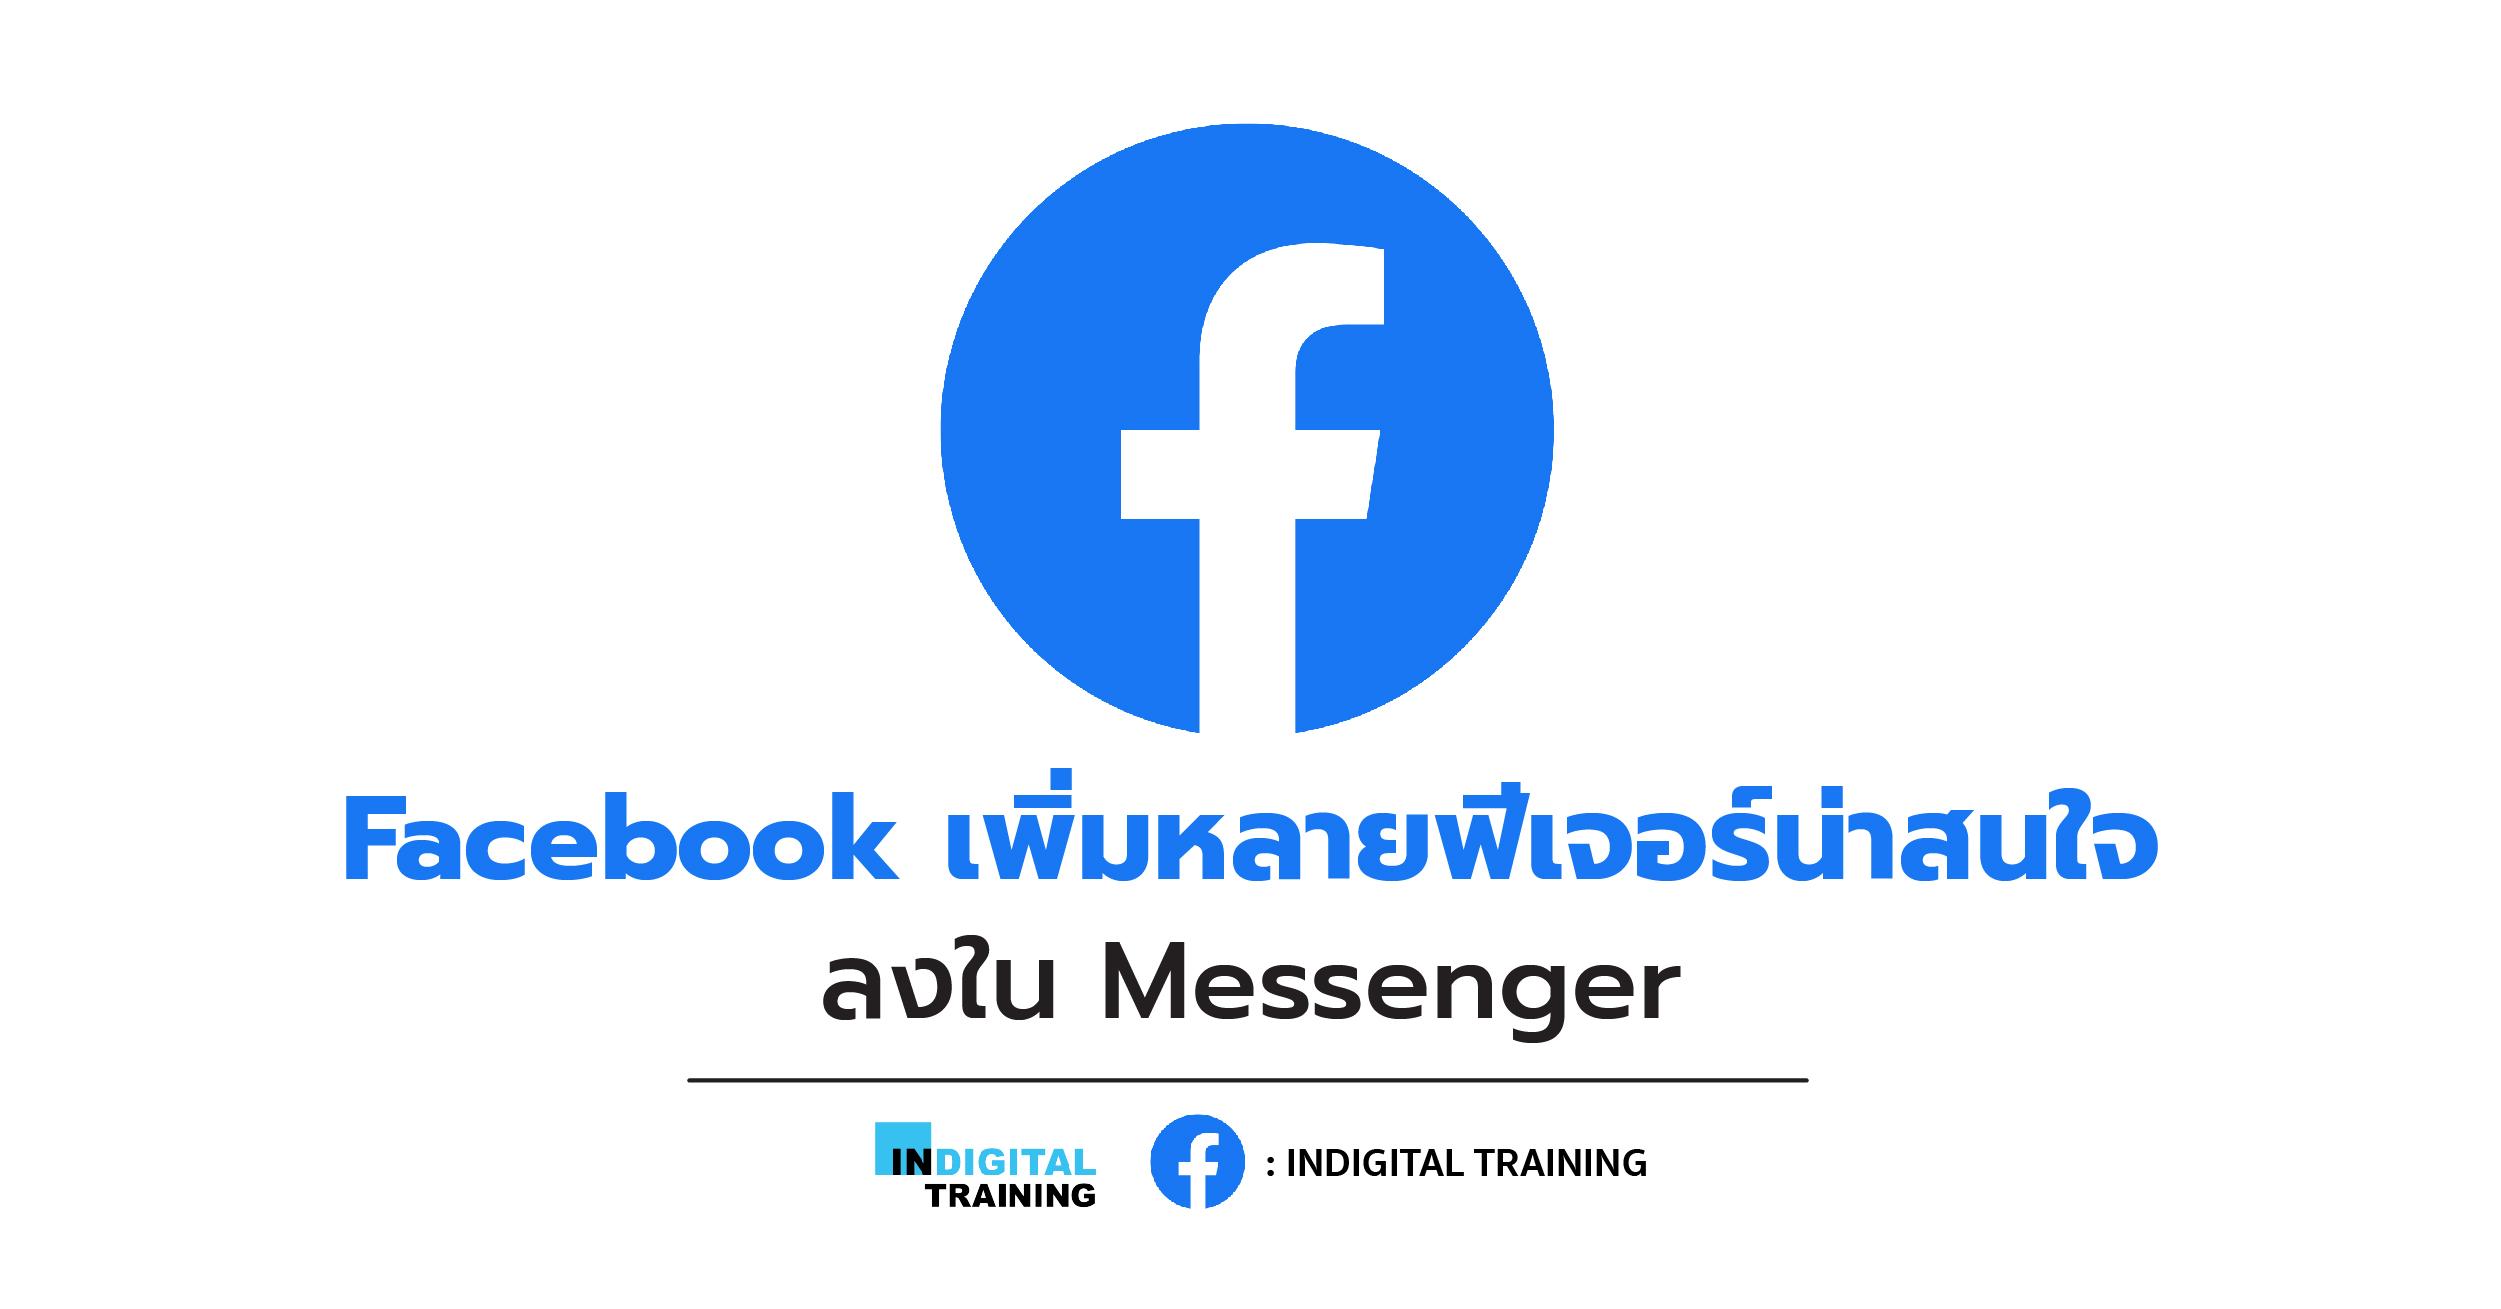 Fcaebook, Instagram, Direct Message, Messenger, Facebook เพิ่มหลายฟีเจอร์น่าสนใจ ลงใน Messenger